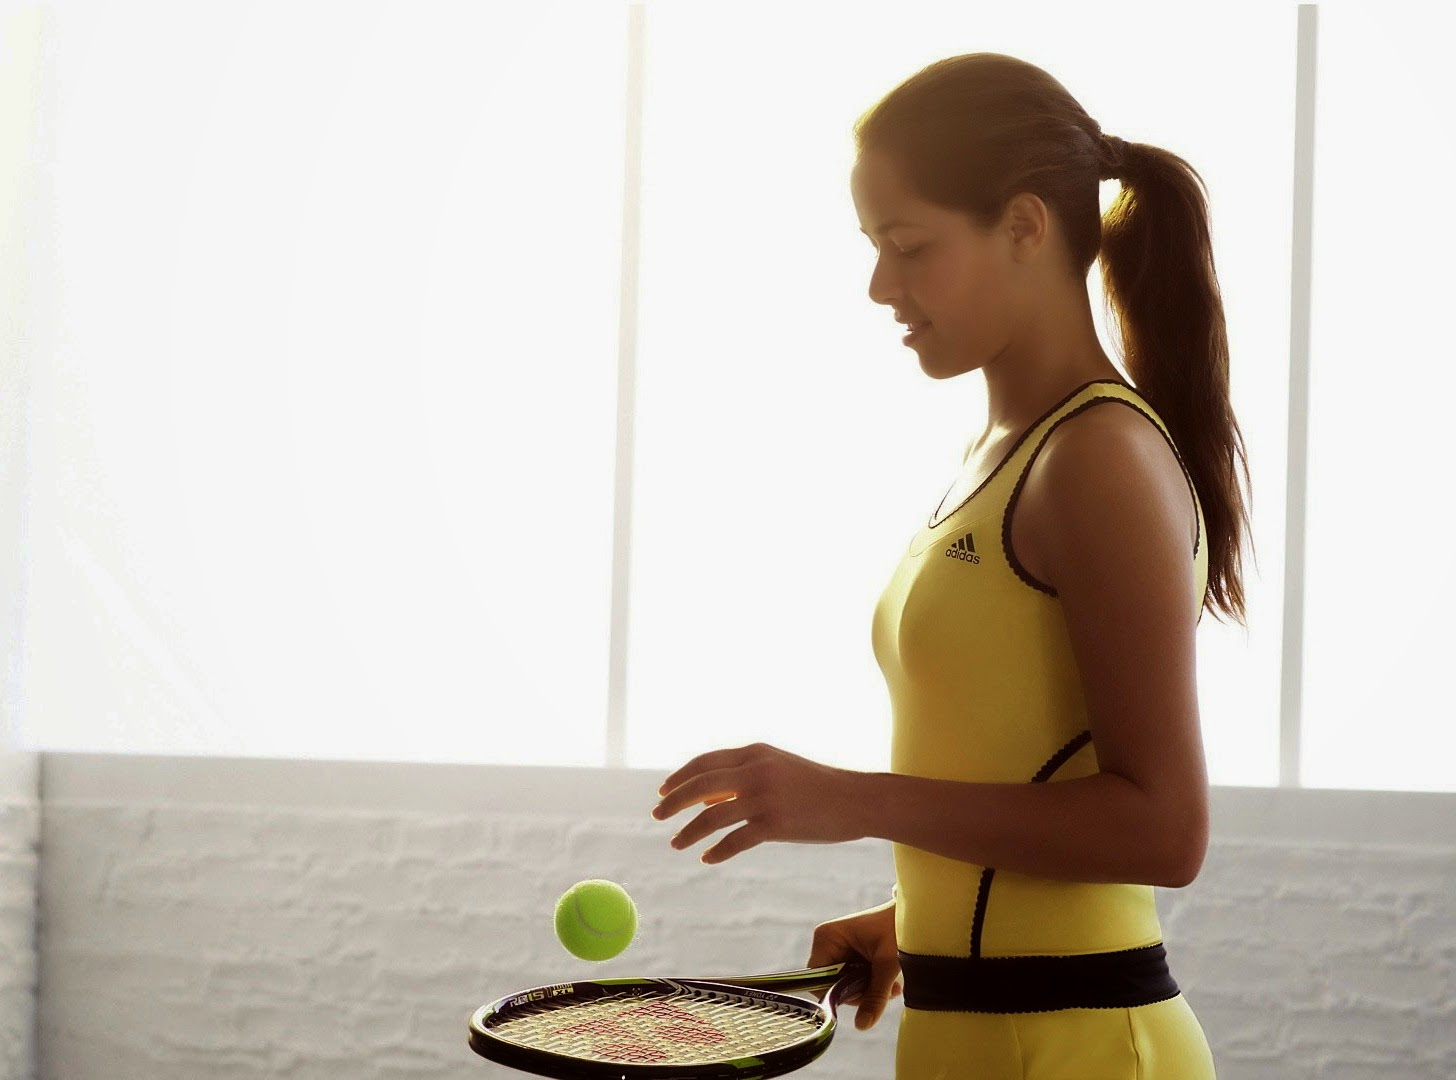 Ana Ivanovic New HD Wallpapers 2014 Lovely Tennis Stars 1456x1080